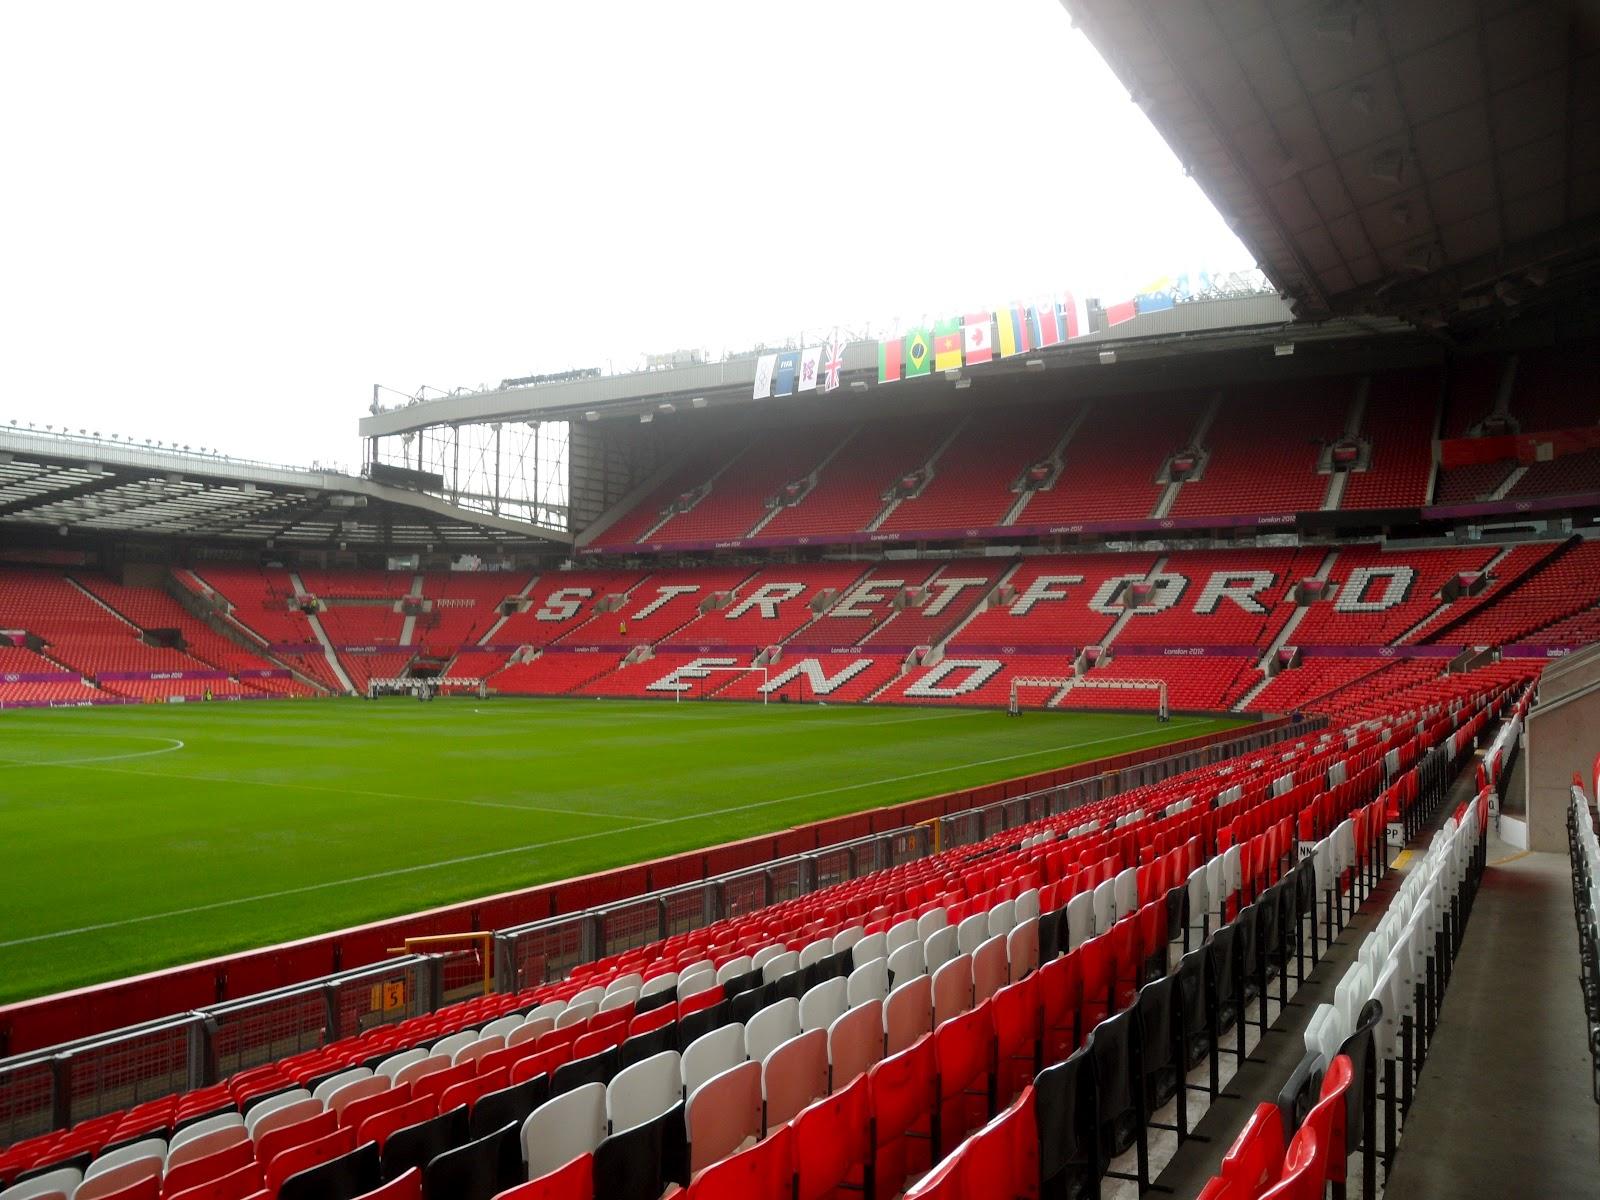 Logan Studies UK Sports: Manchester United Stadium Tour